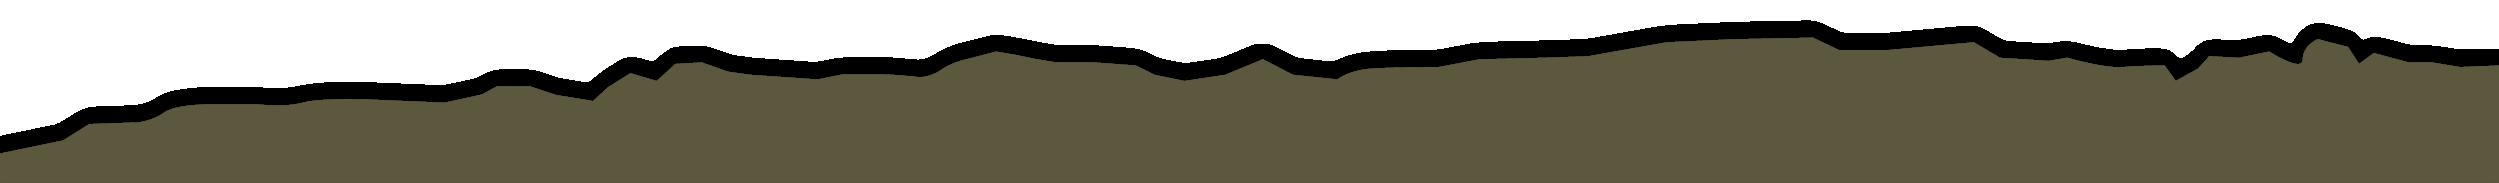 arborator-denim-company-maastricht-haarlem-gescheurde-rand-donker-groen-footer-v2